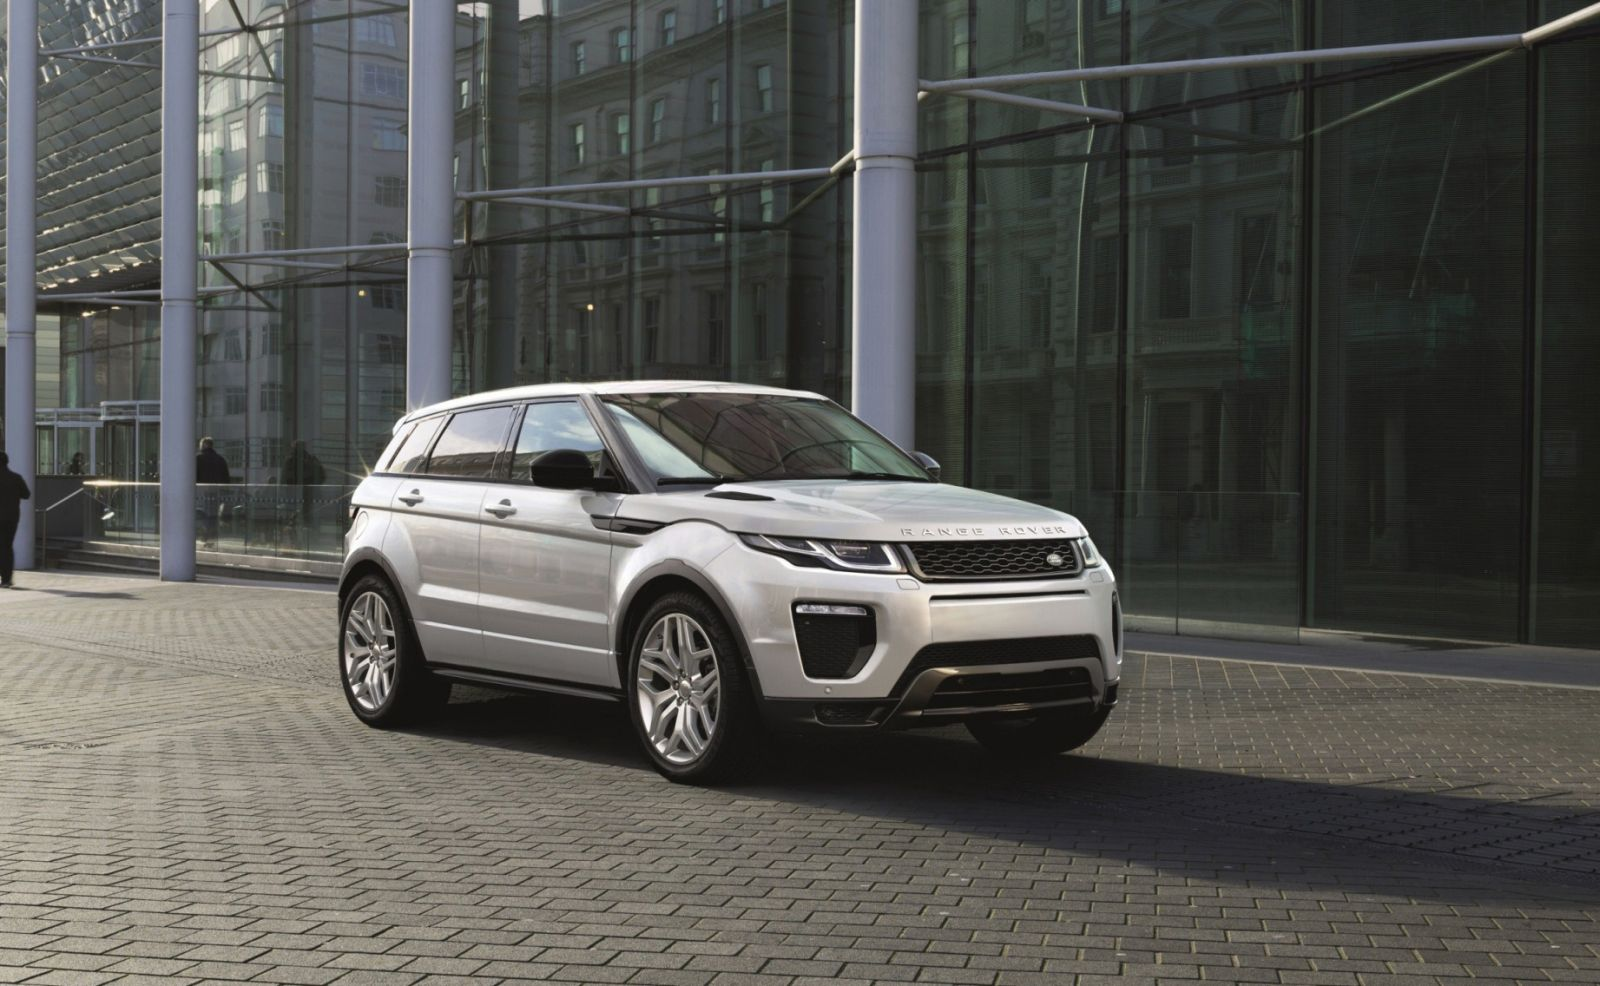 2016 Range Rover Evoque Diesel Recalled Over Potential Fuel Leak